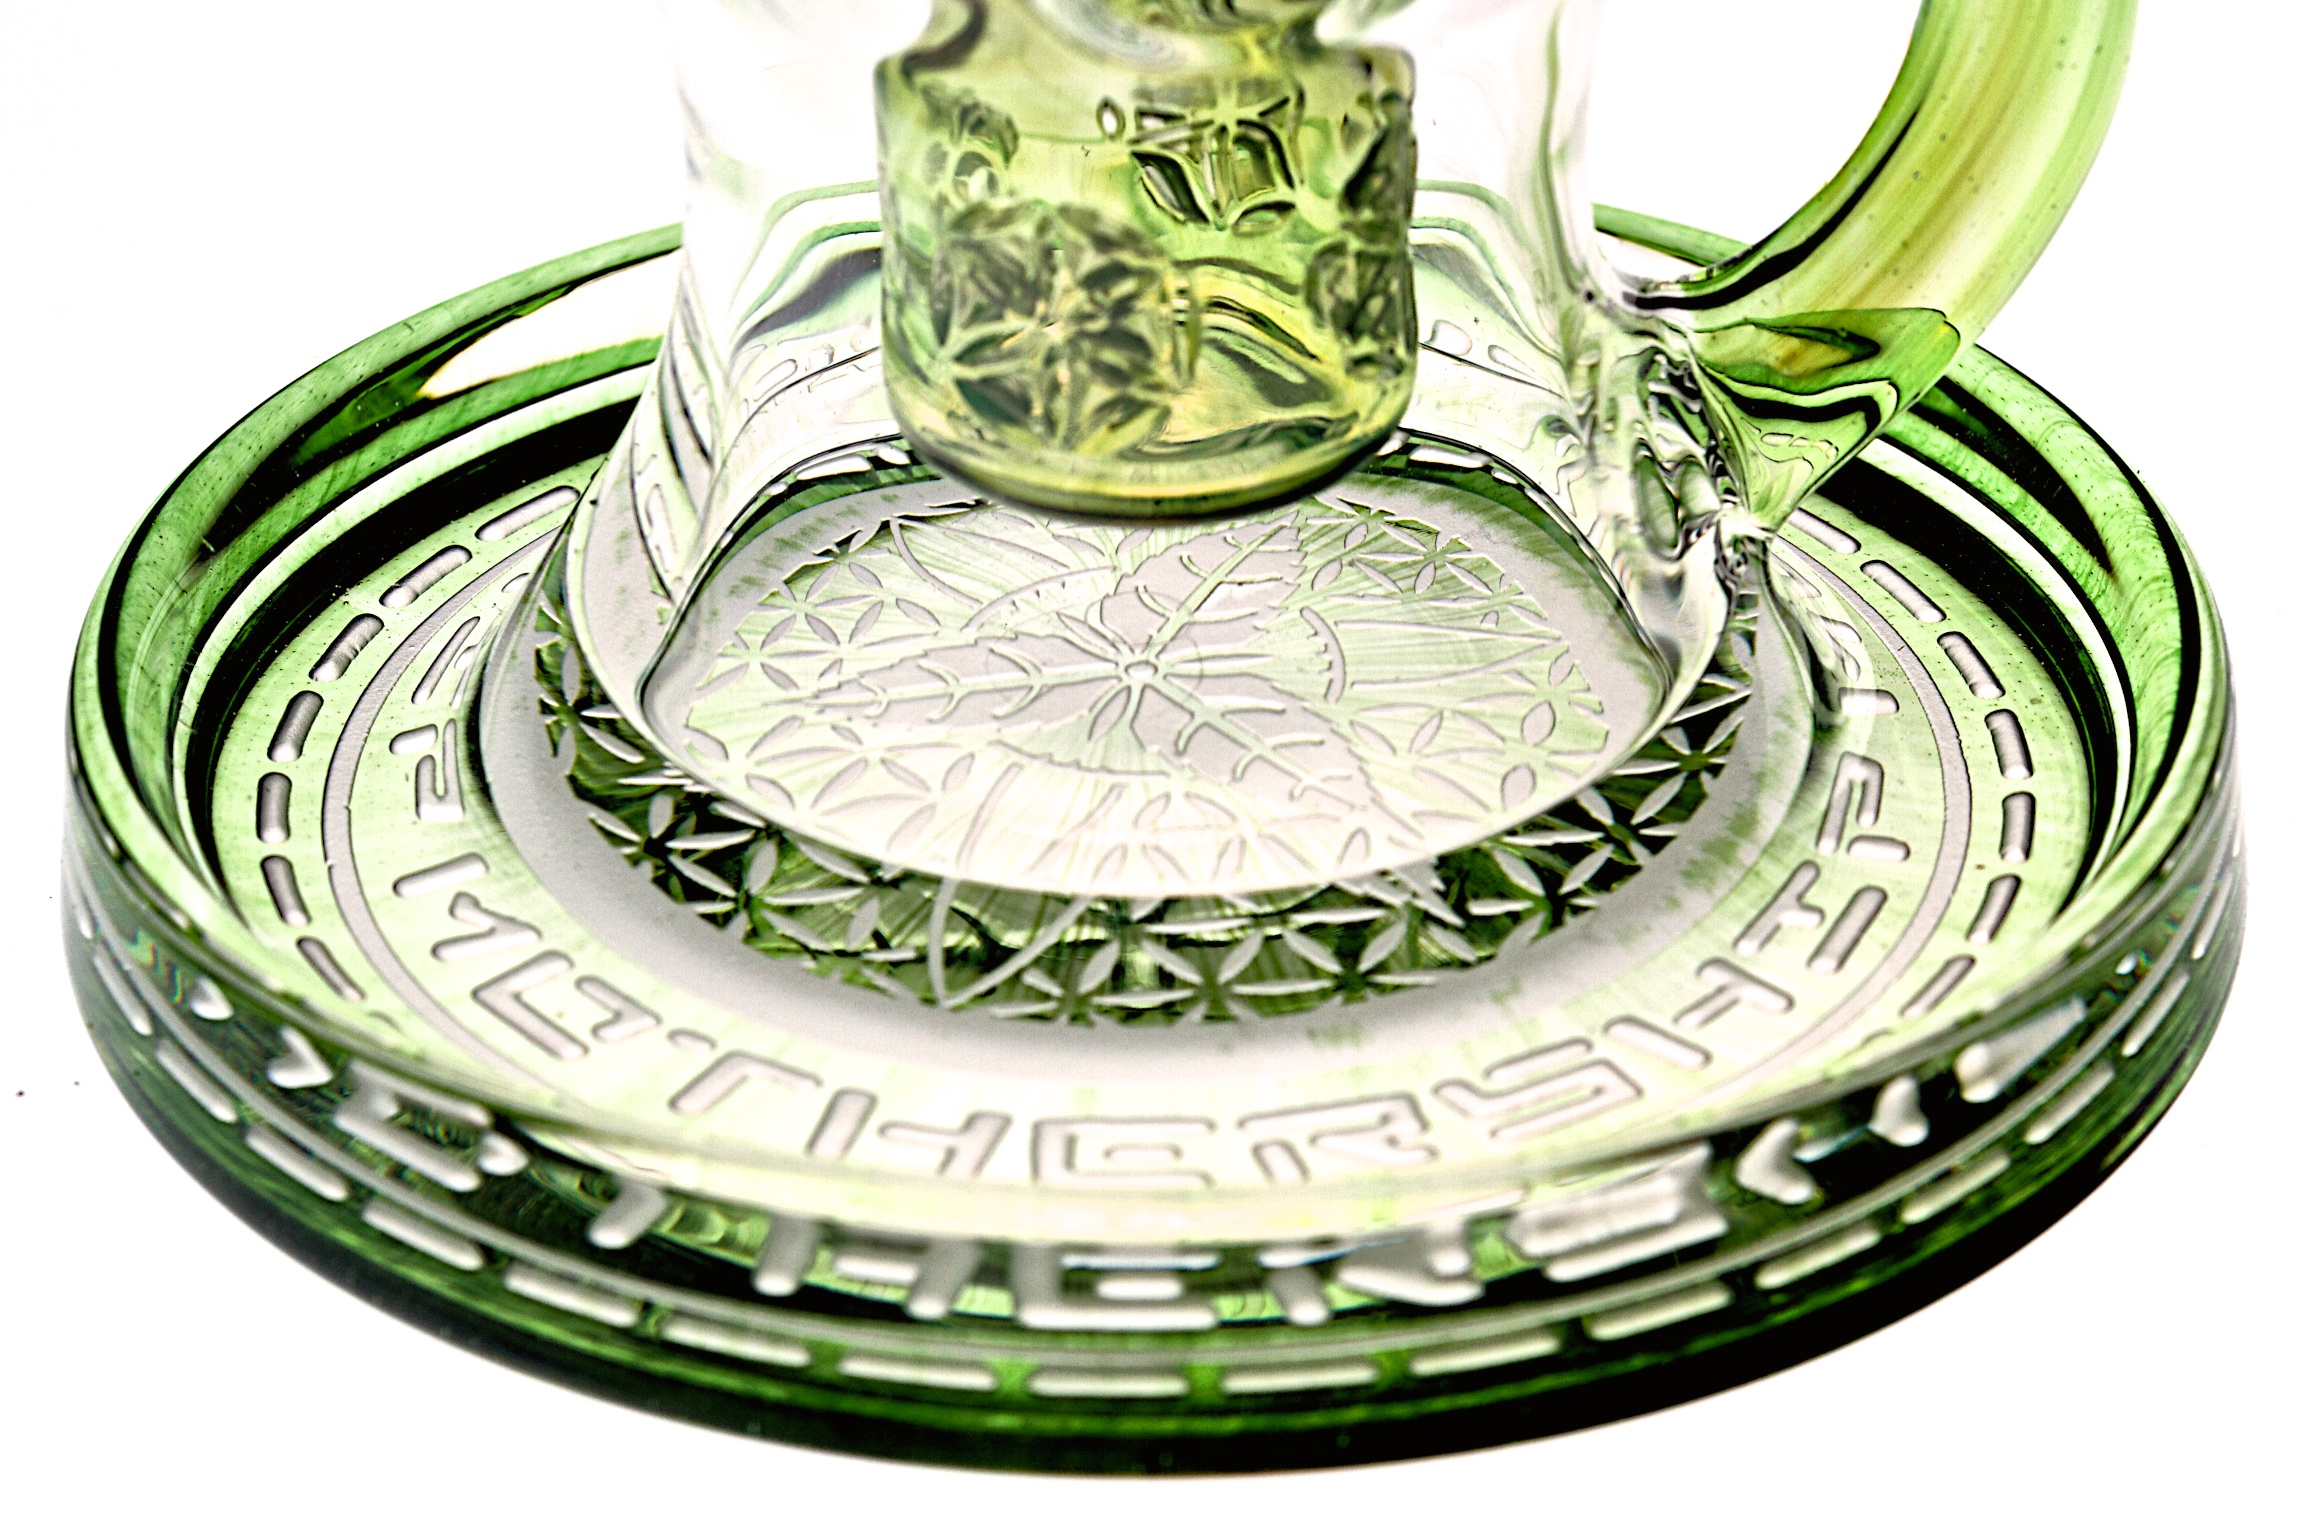 www.HighIntegrityGlassArt.com76.jpg